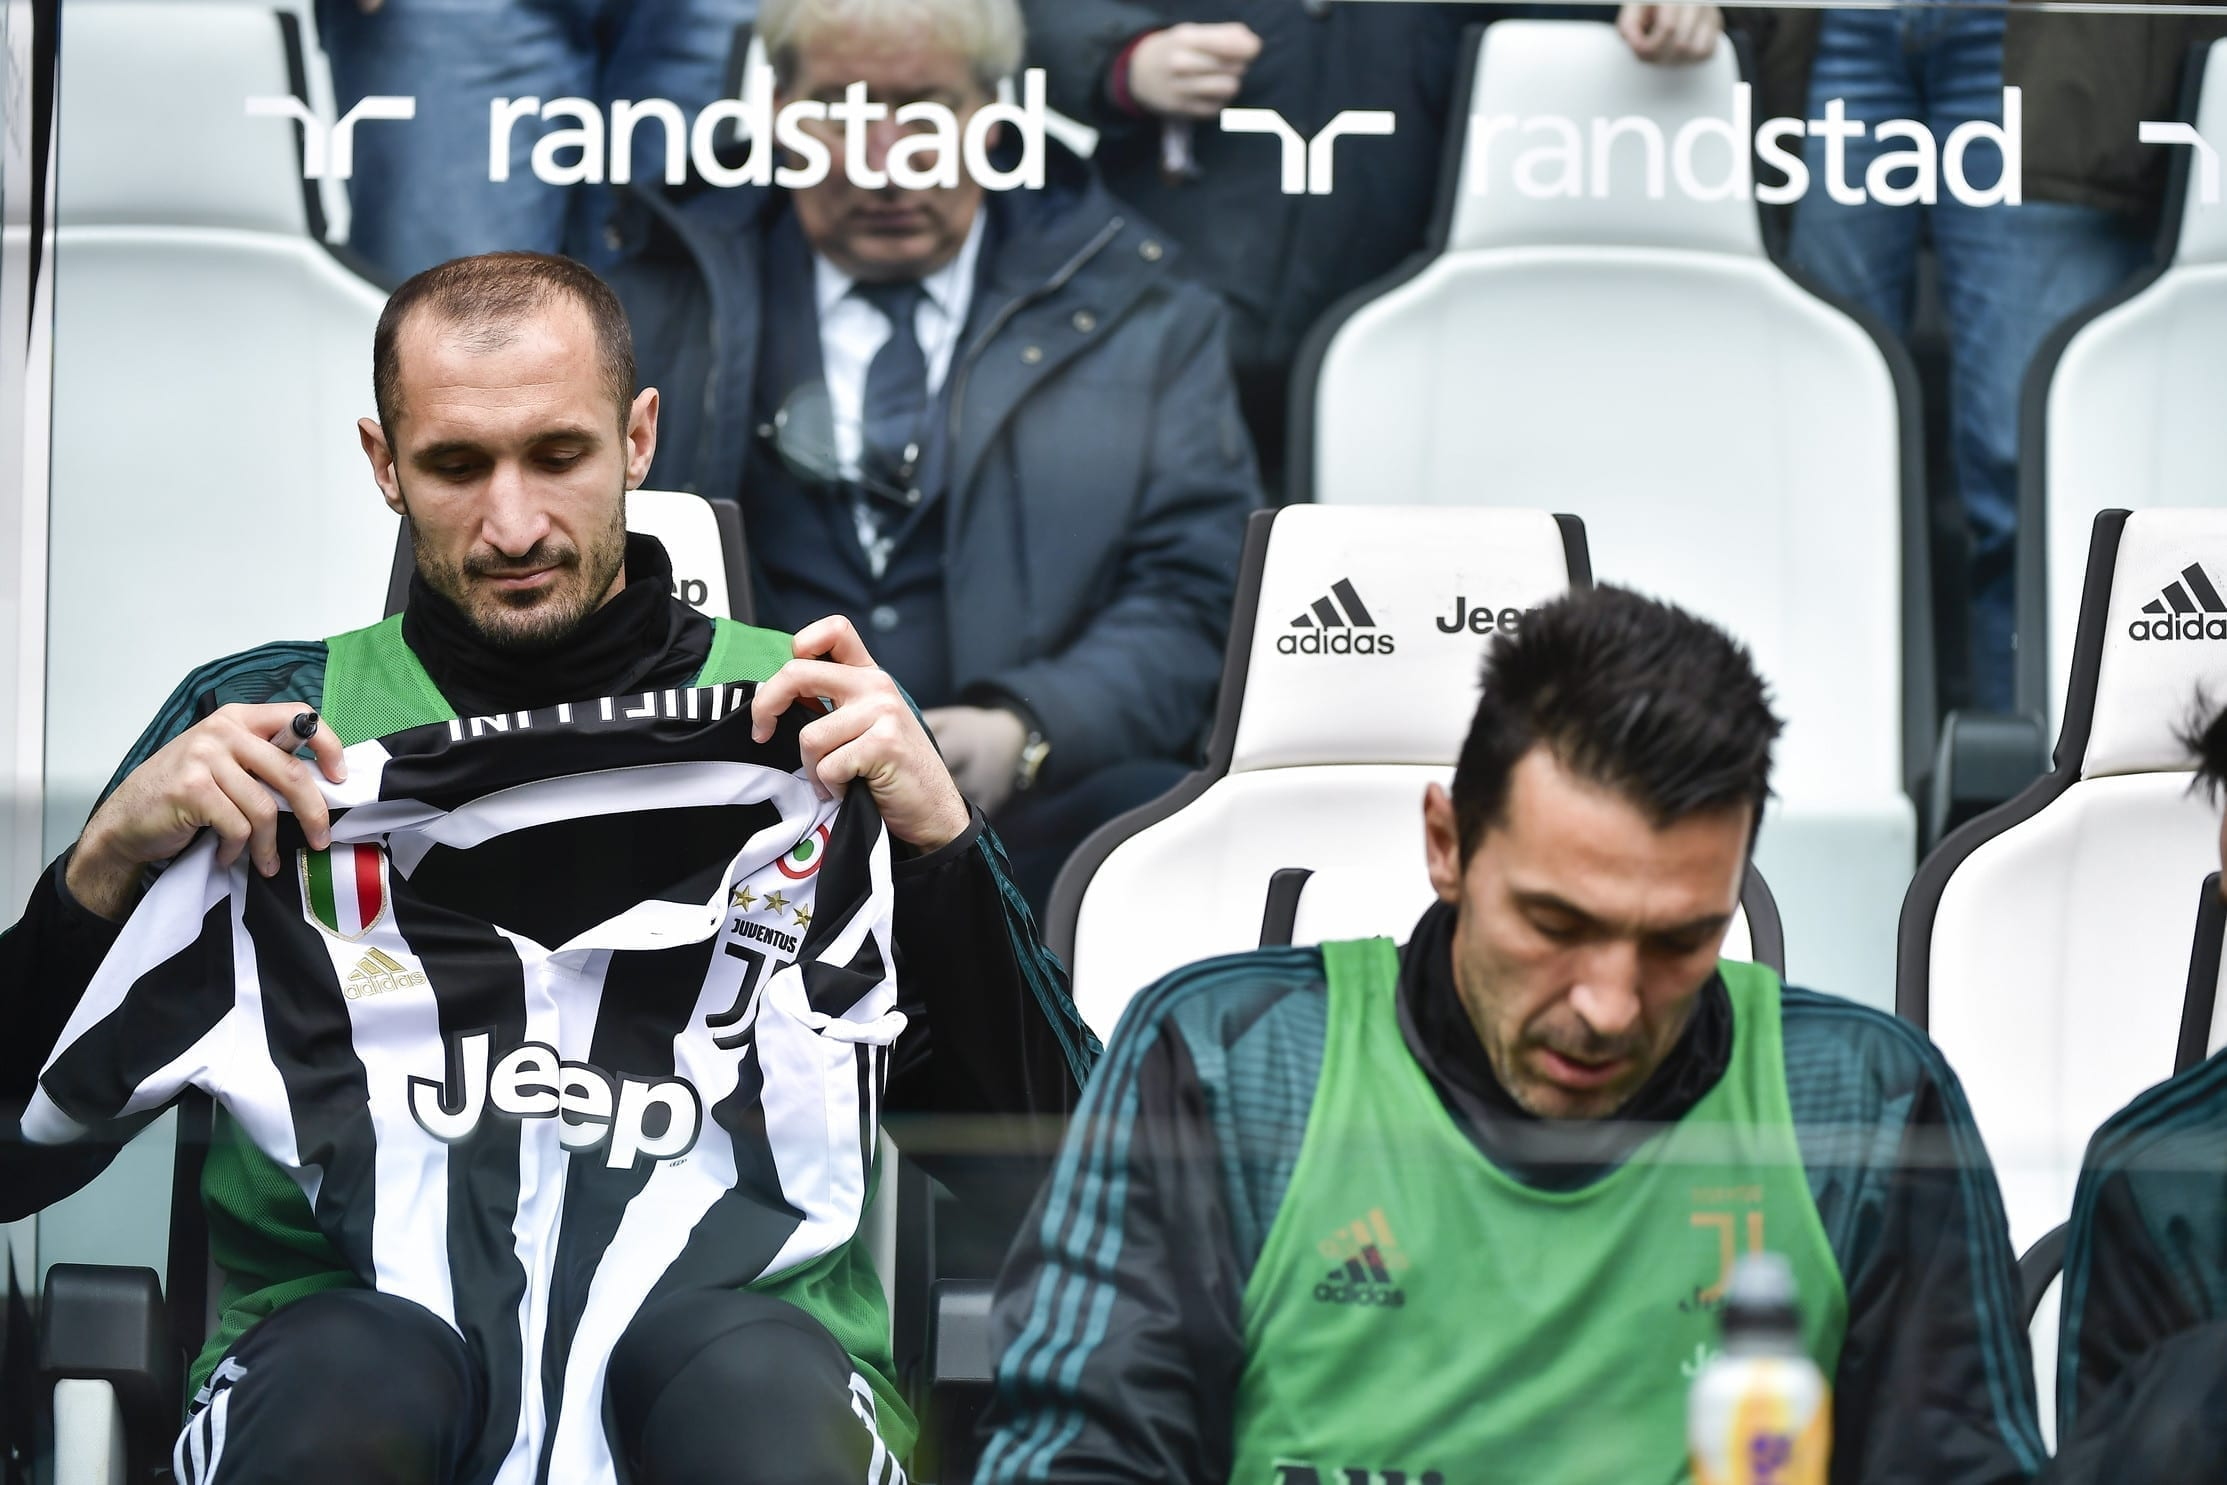 Chiellini e Buffon, Juventus